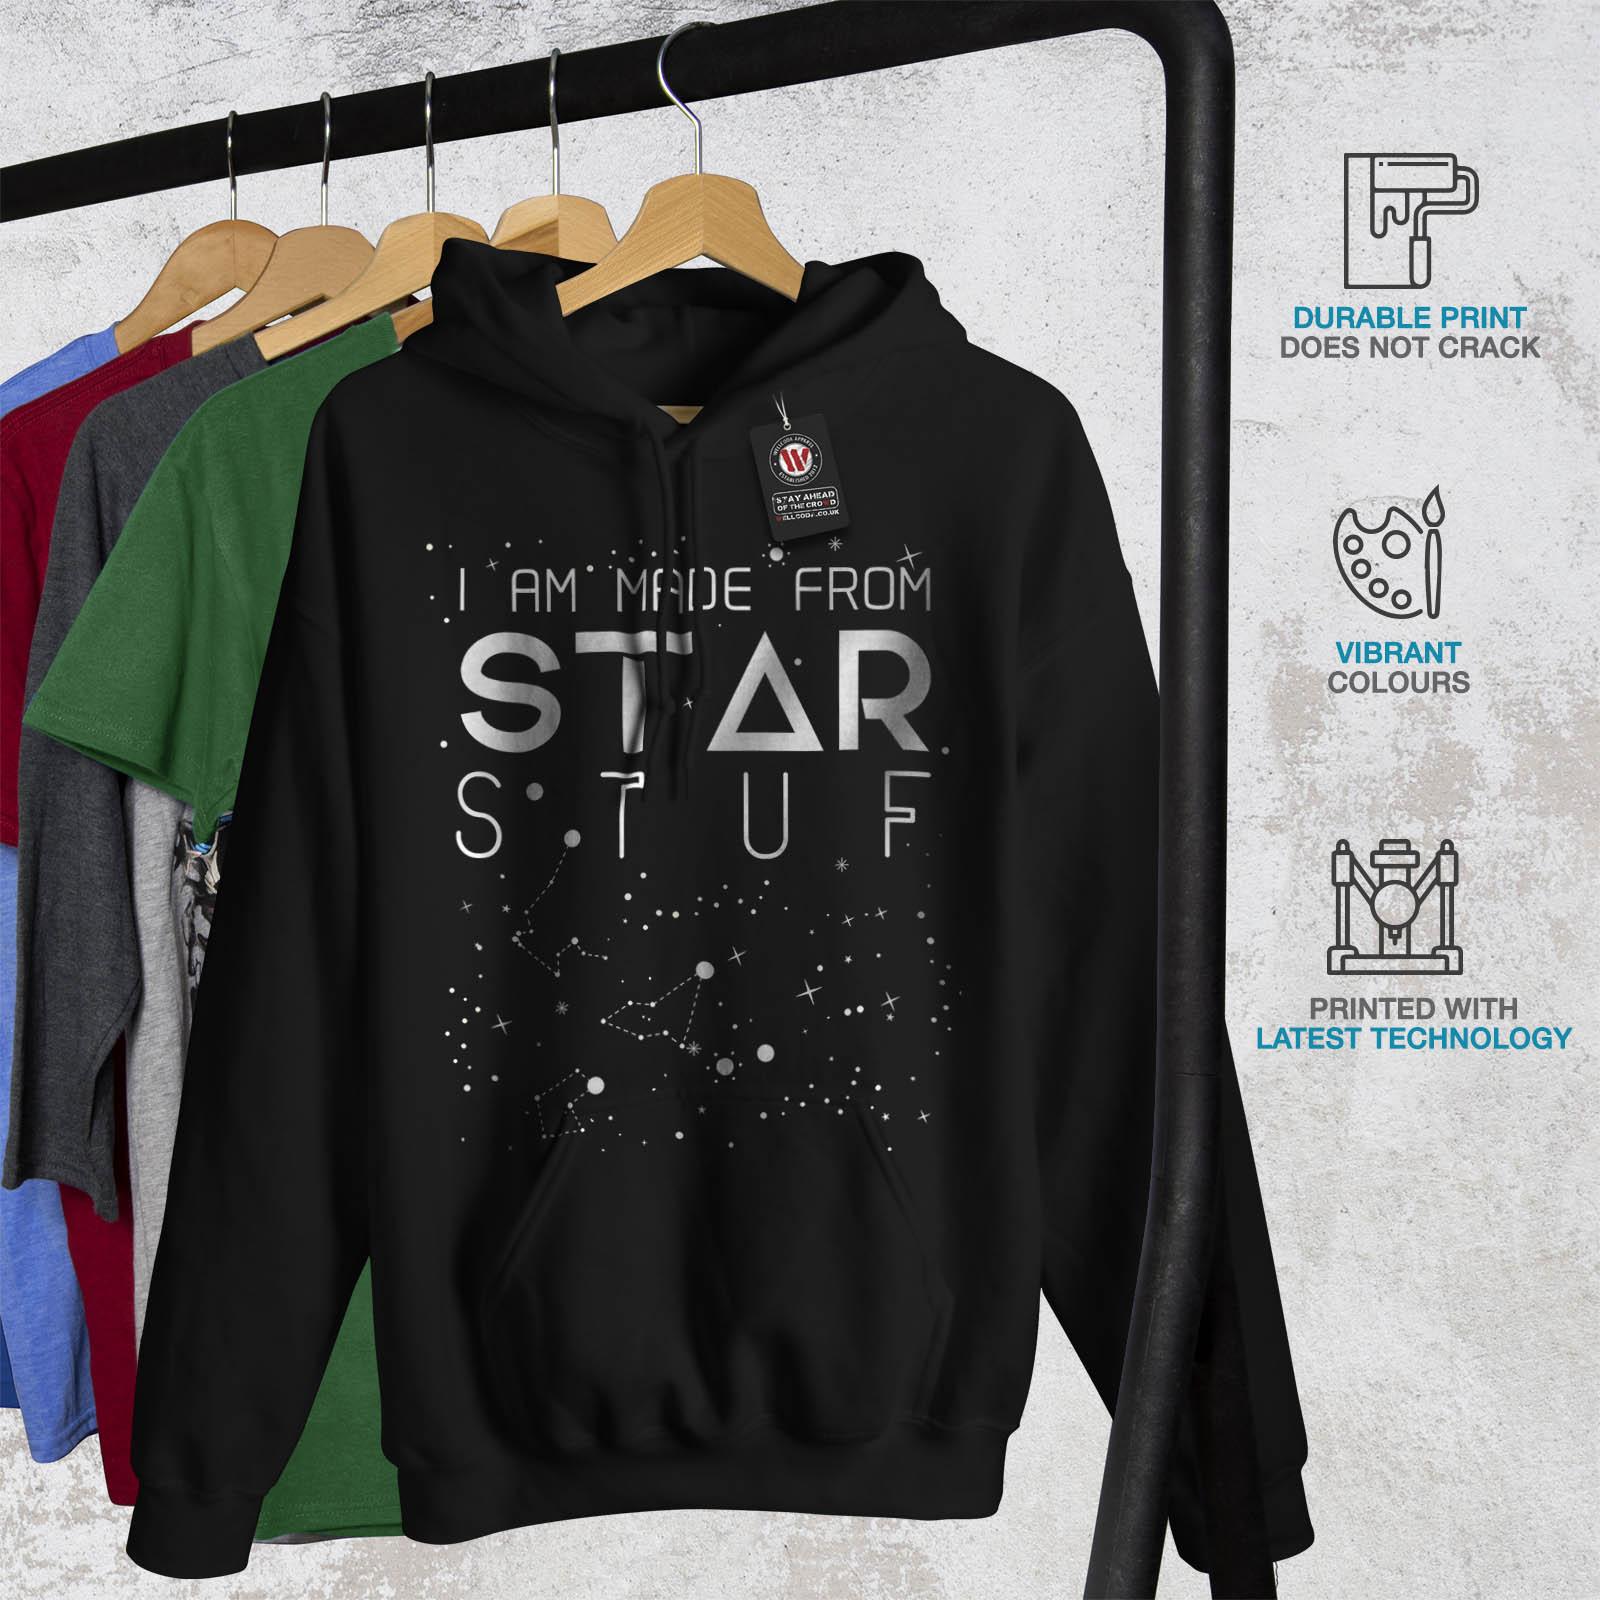 Funny Casual Jumper wellcoda Stars Astronomy Quote Mens Sweatshirt